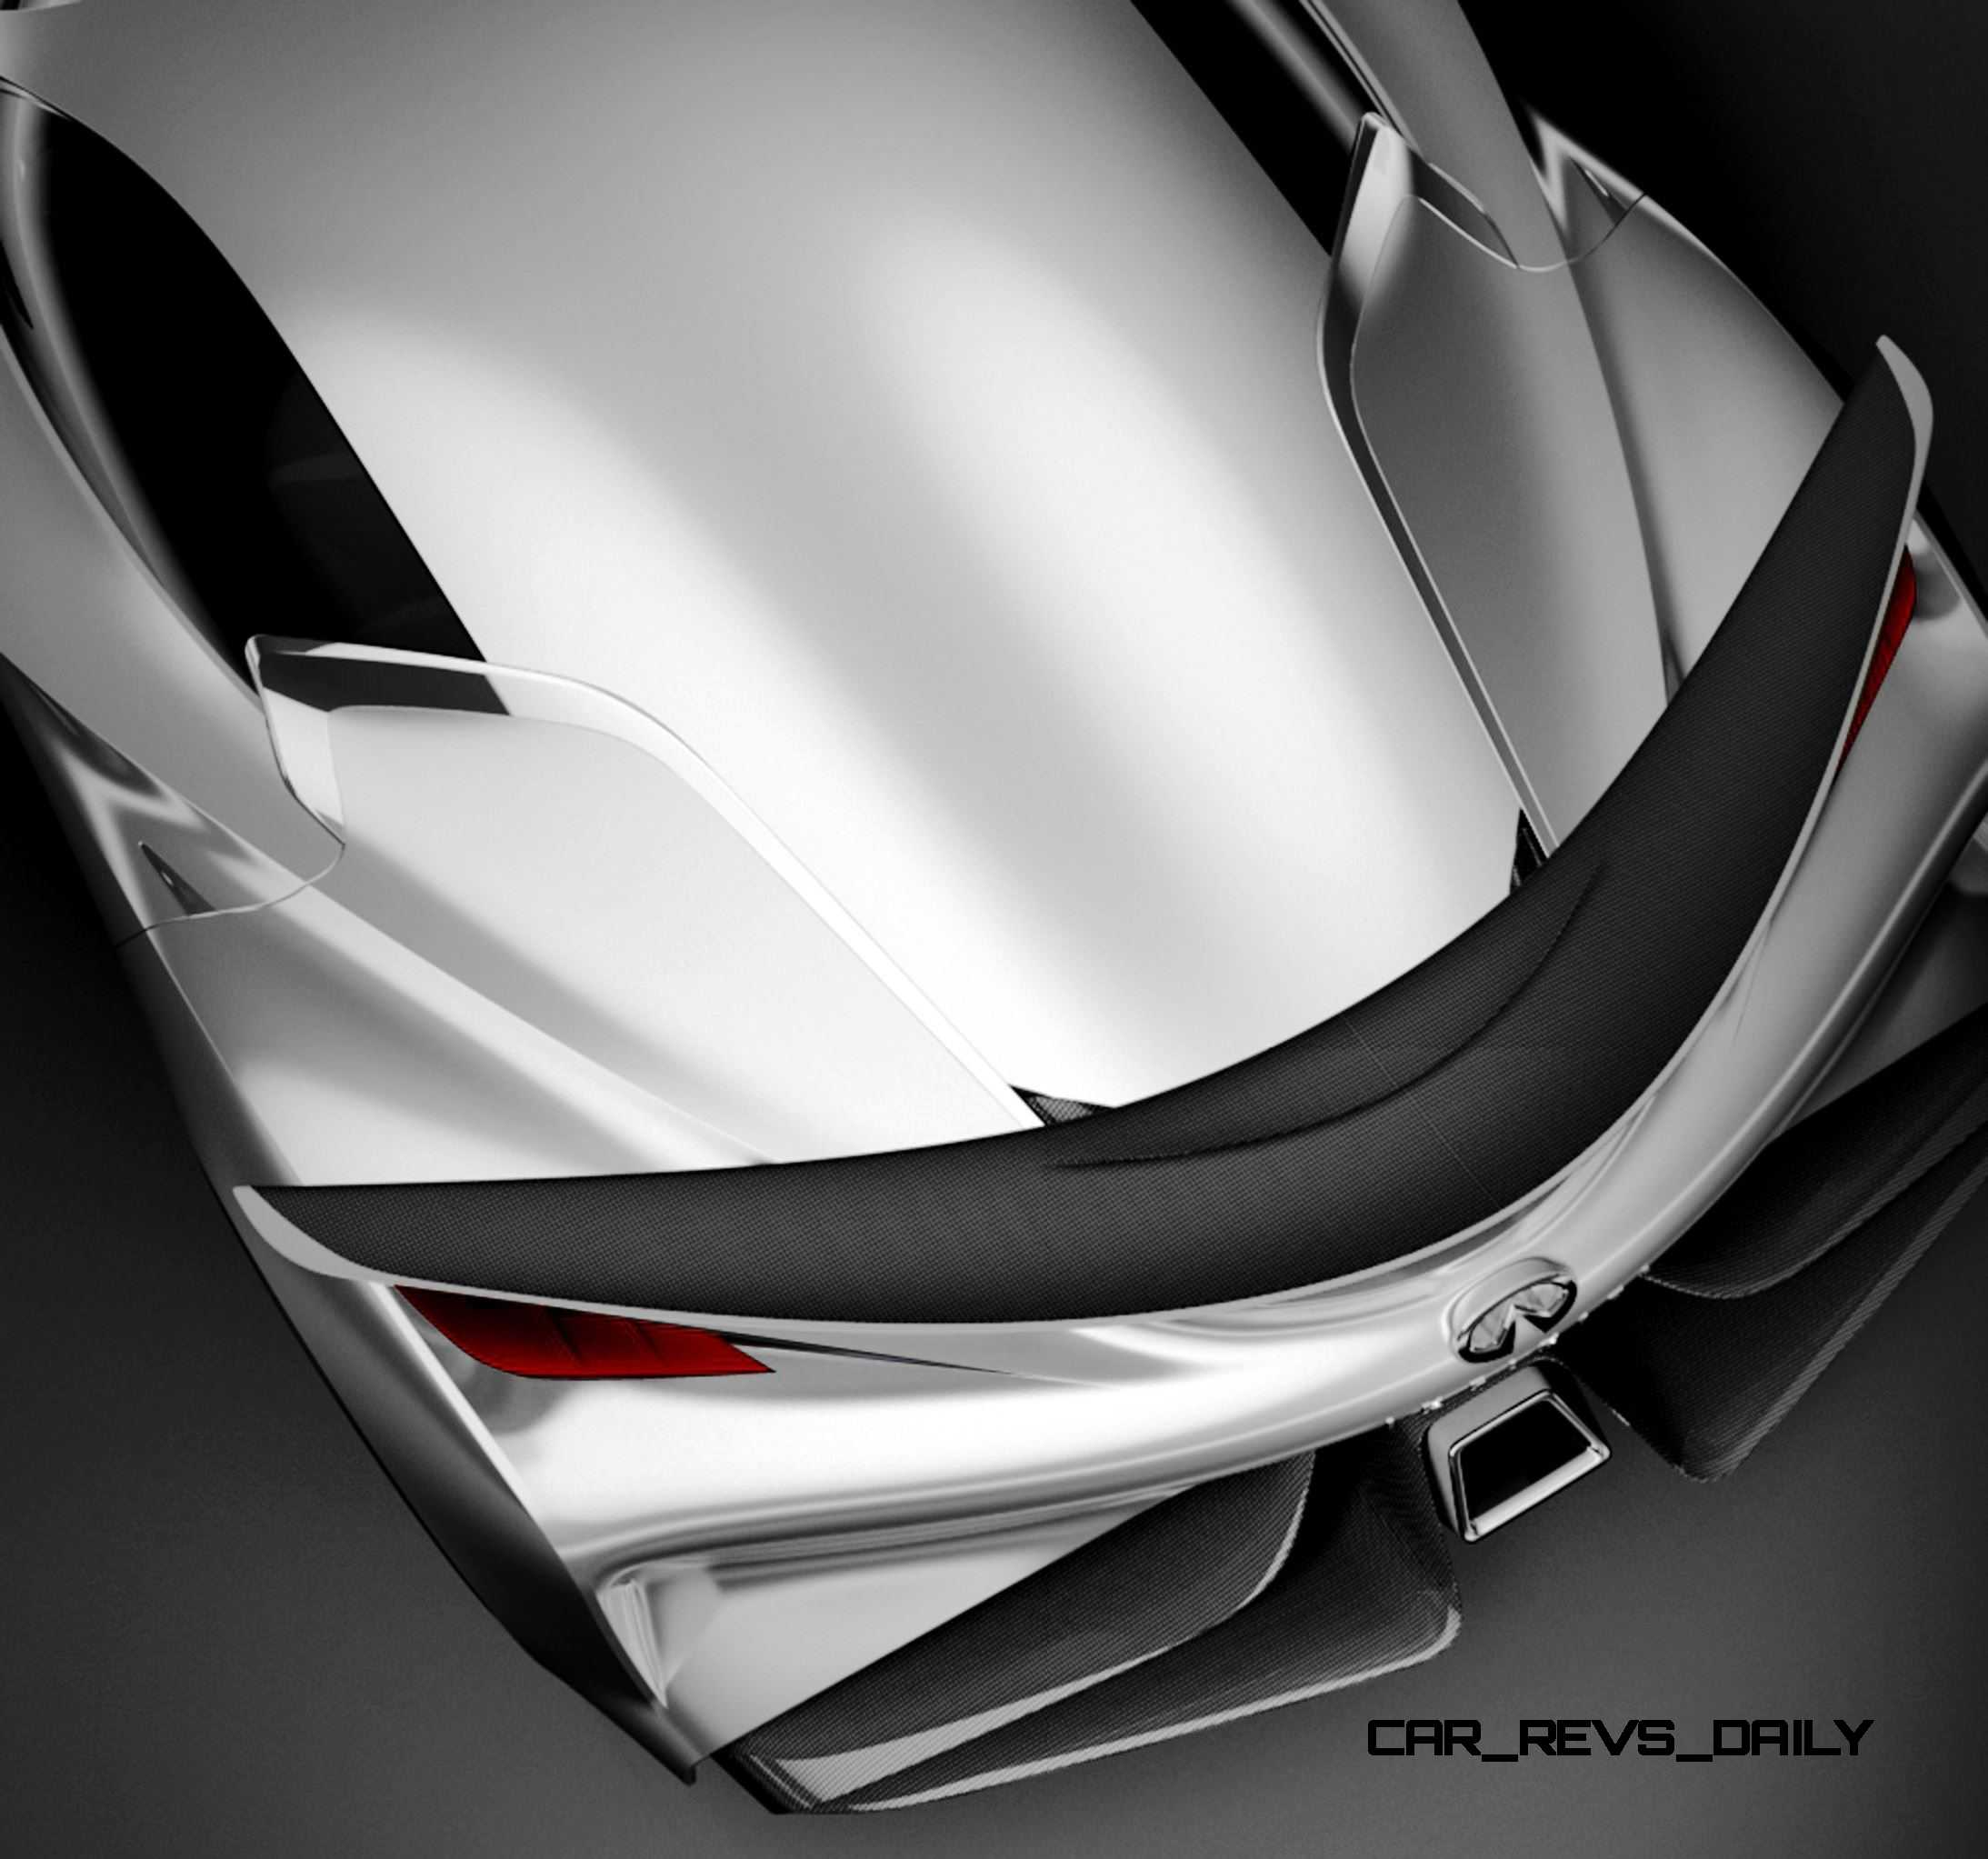 2014 INFINITI Concept Vision Gran Turismo 56